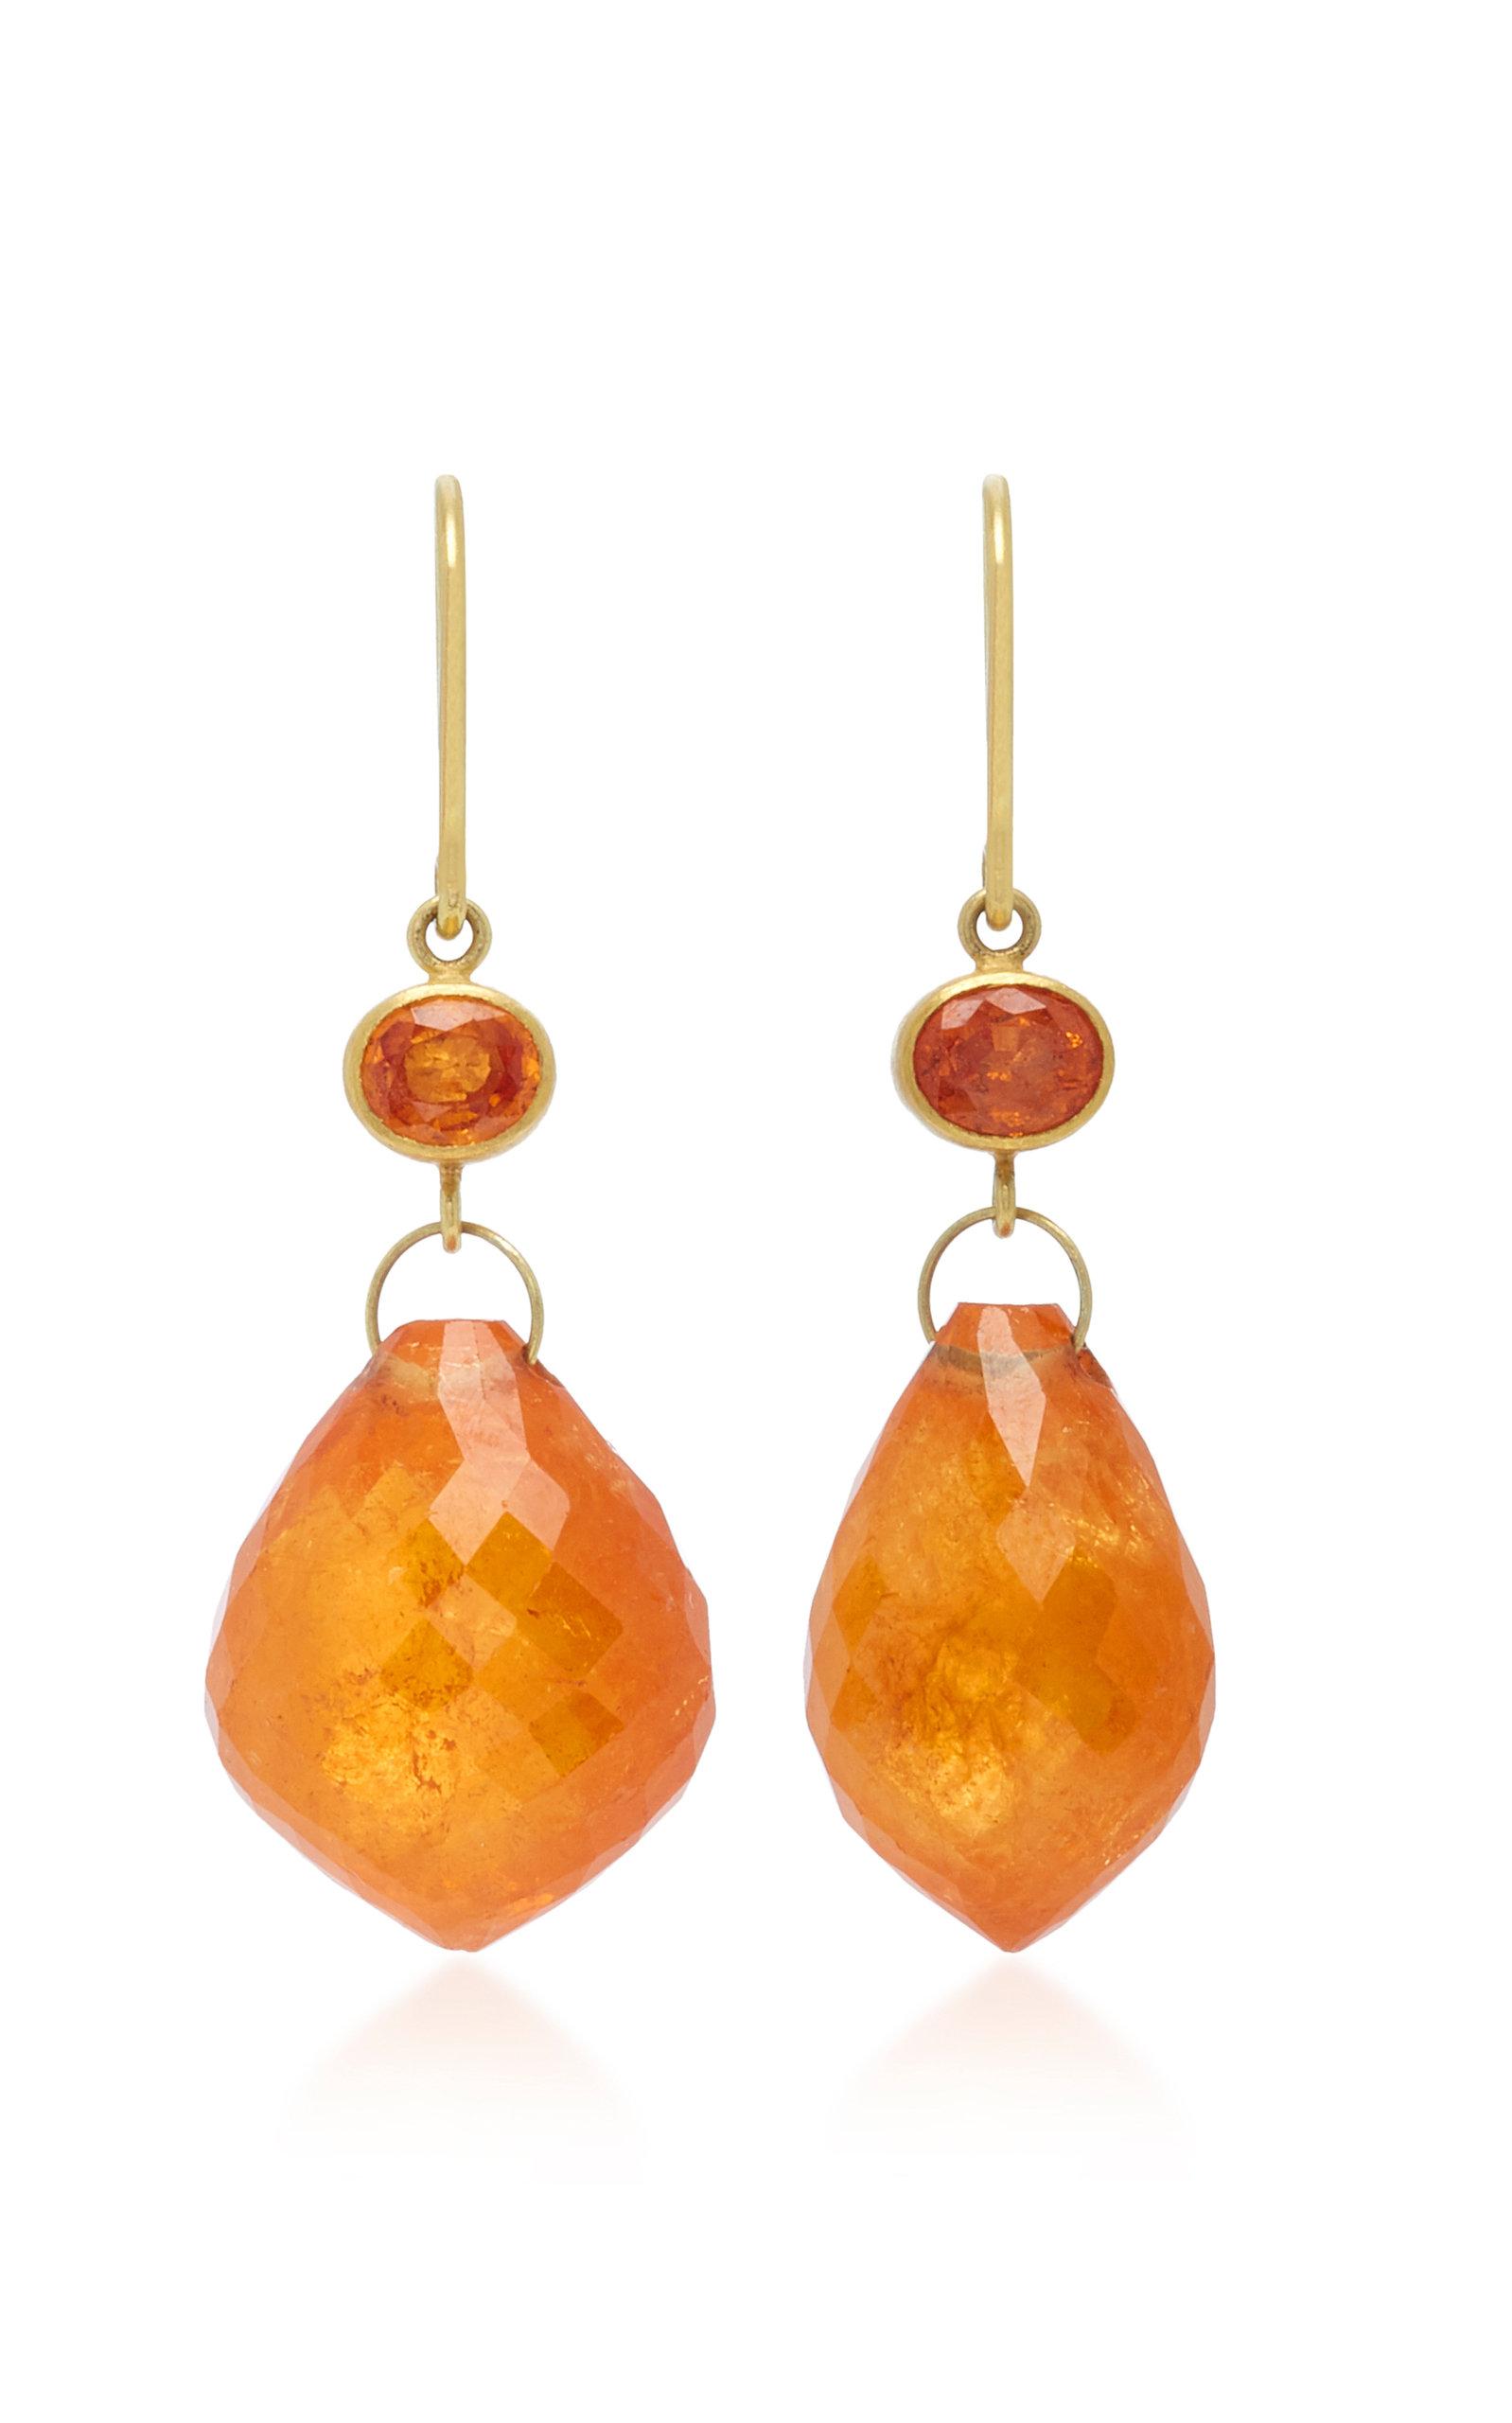 MALLARY MARKS Apple & Eve 18K Gold Sapphire And Briolette Earrings in Orange